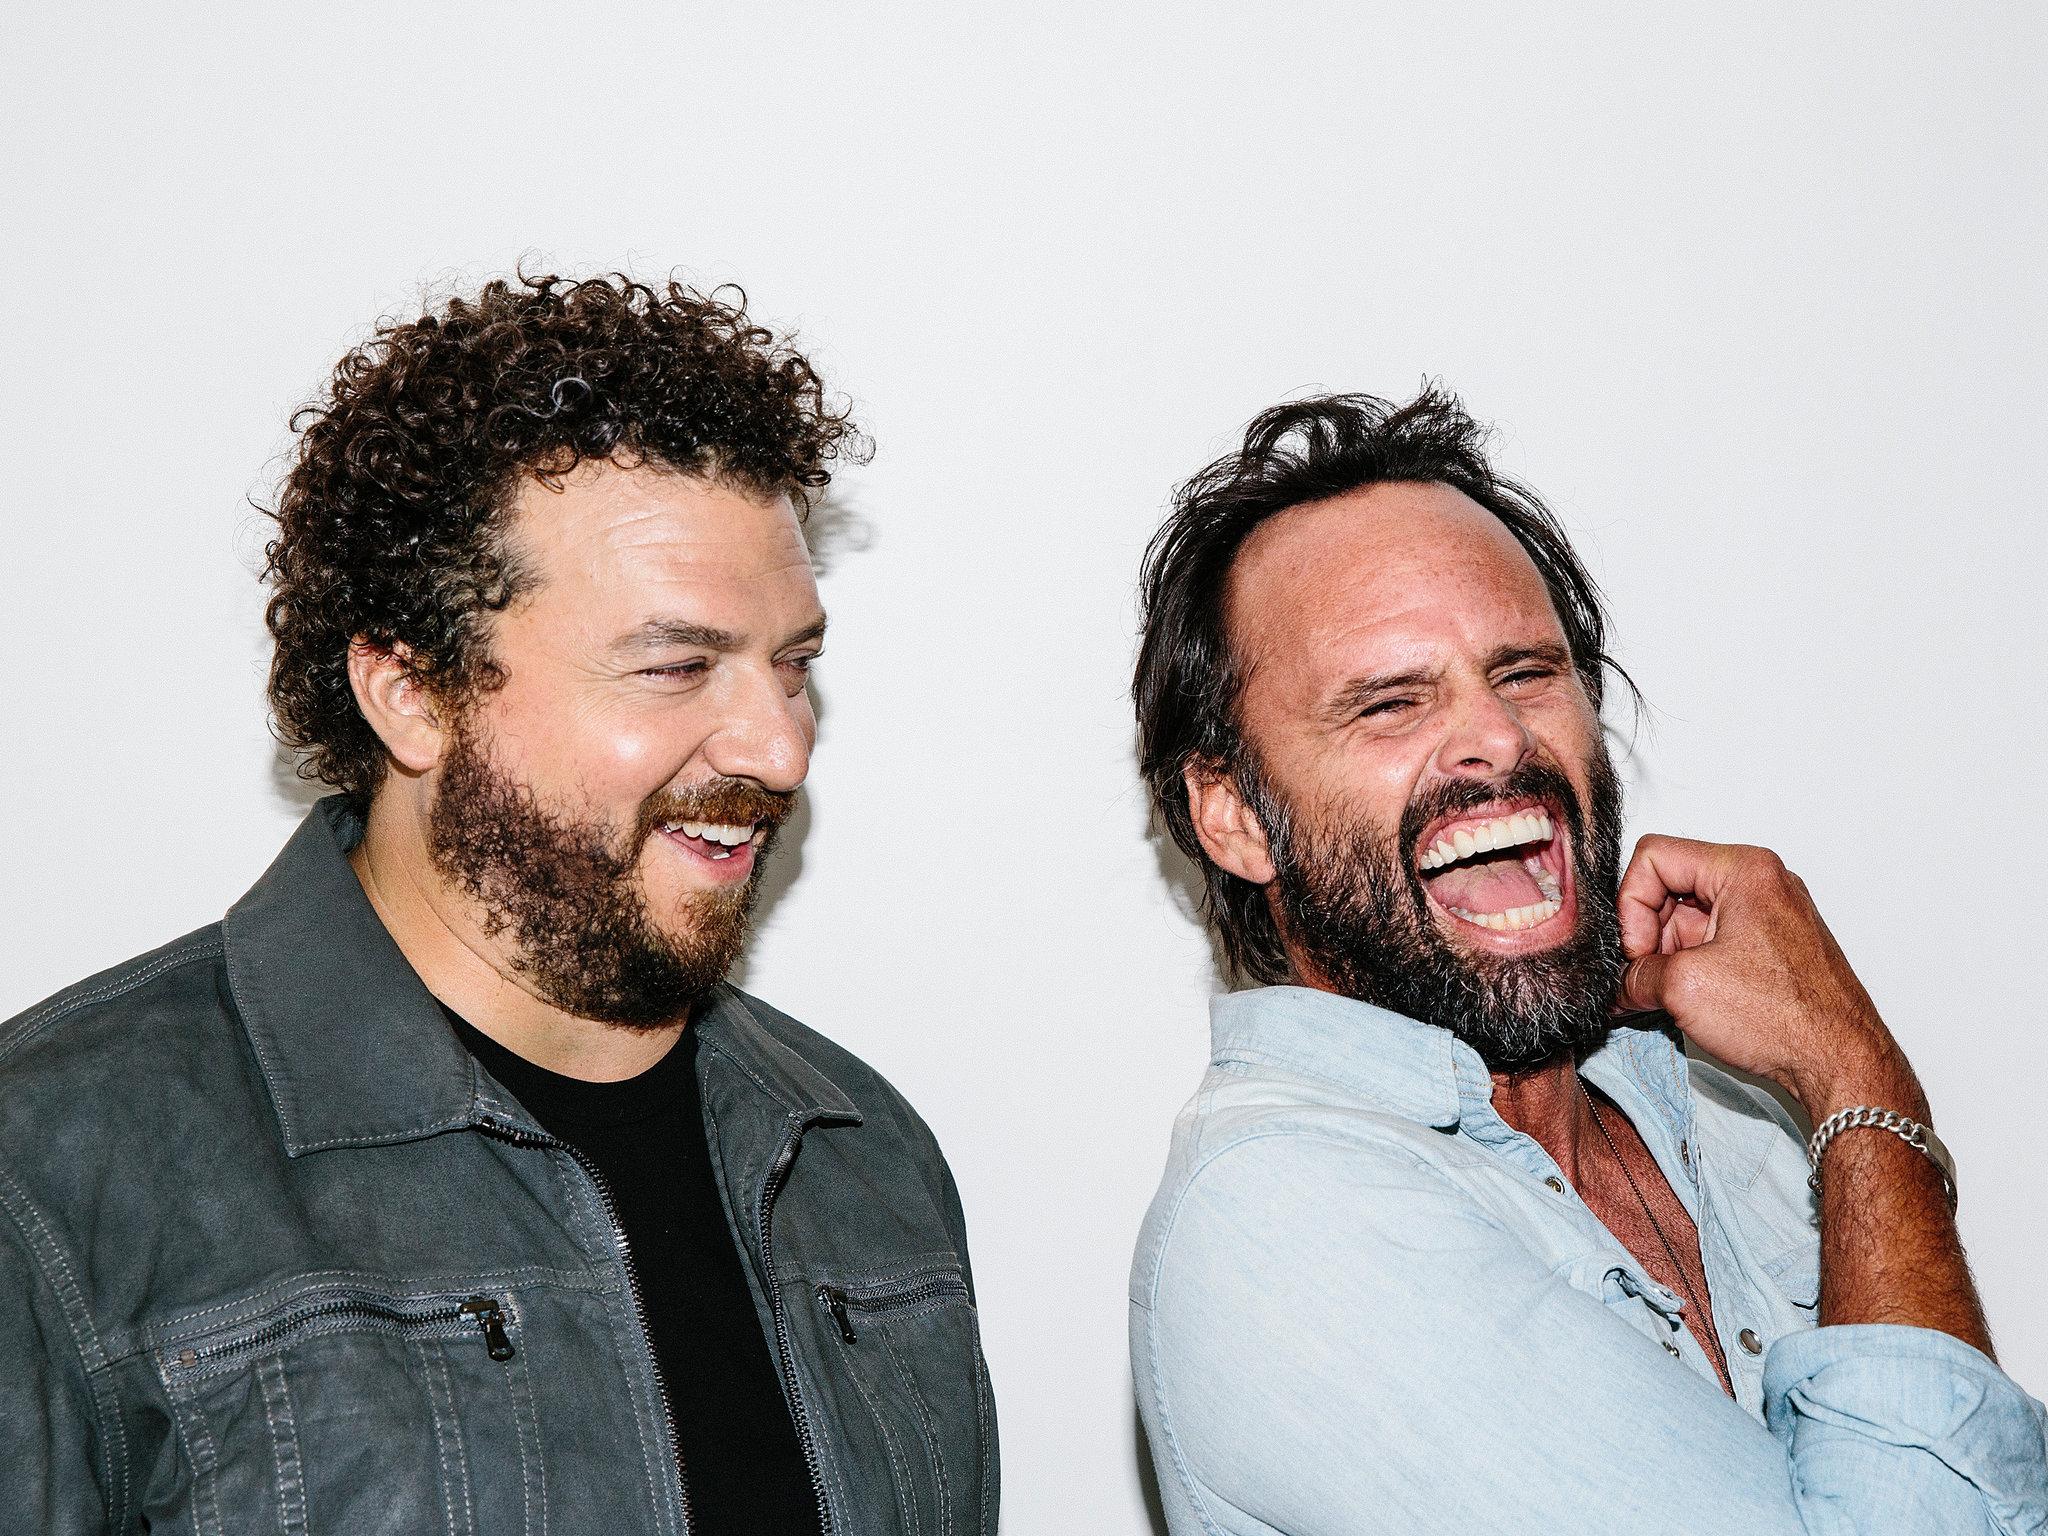 Danny McBride and Walton Goggins - New York Times Photoshoot - 2016